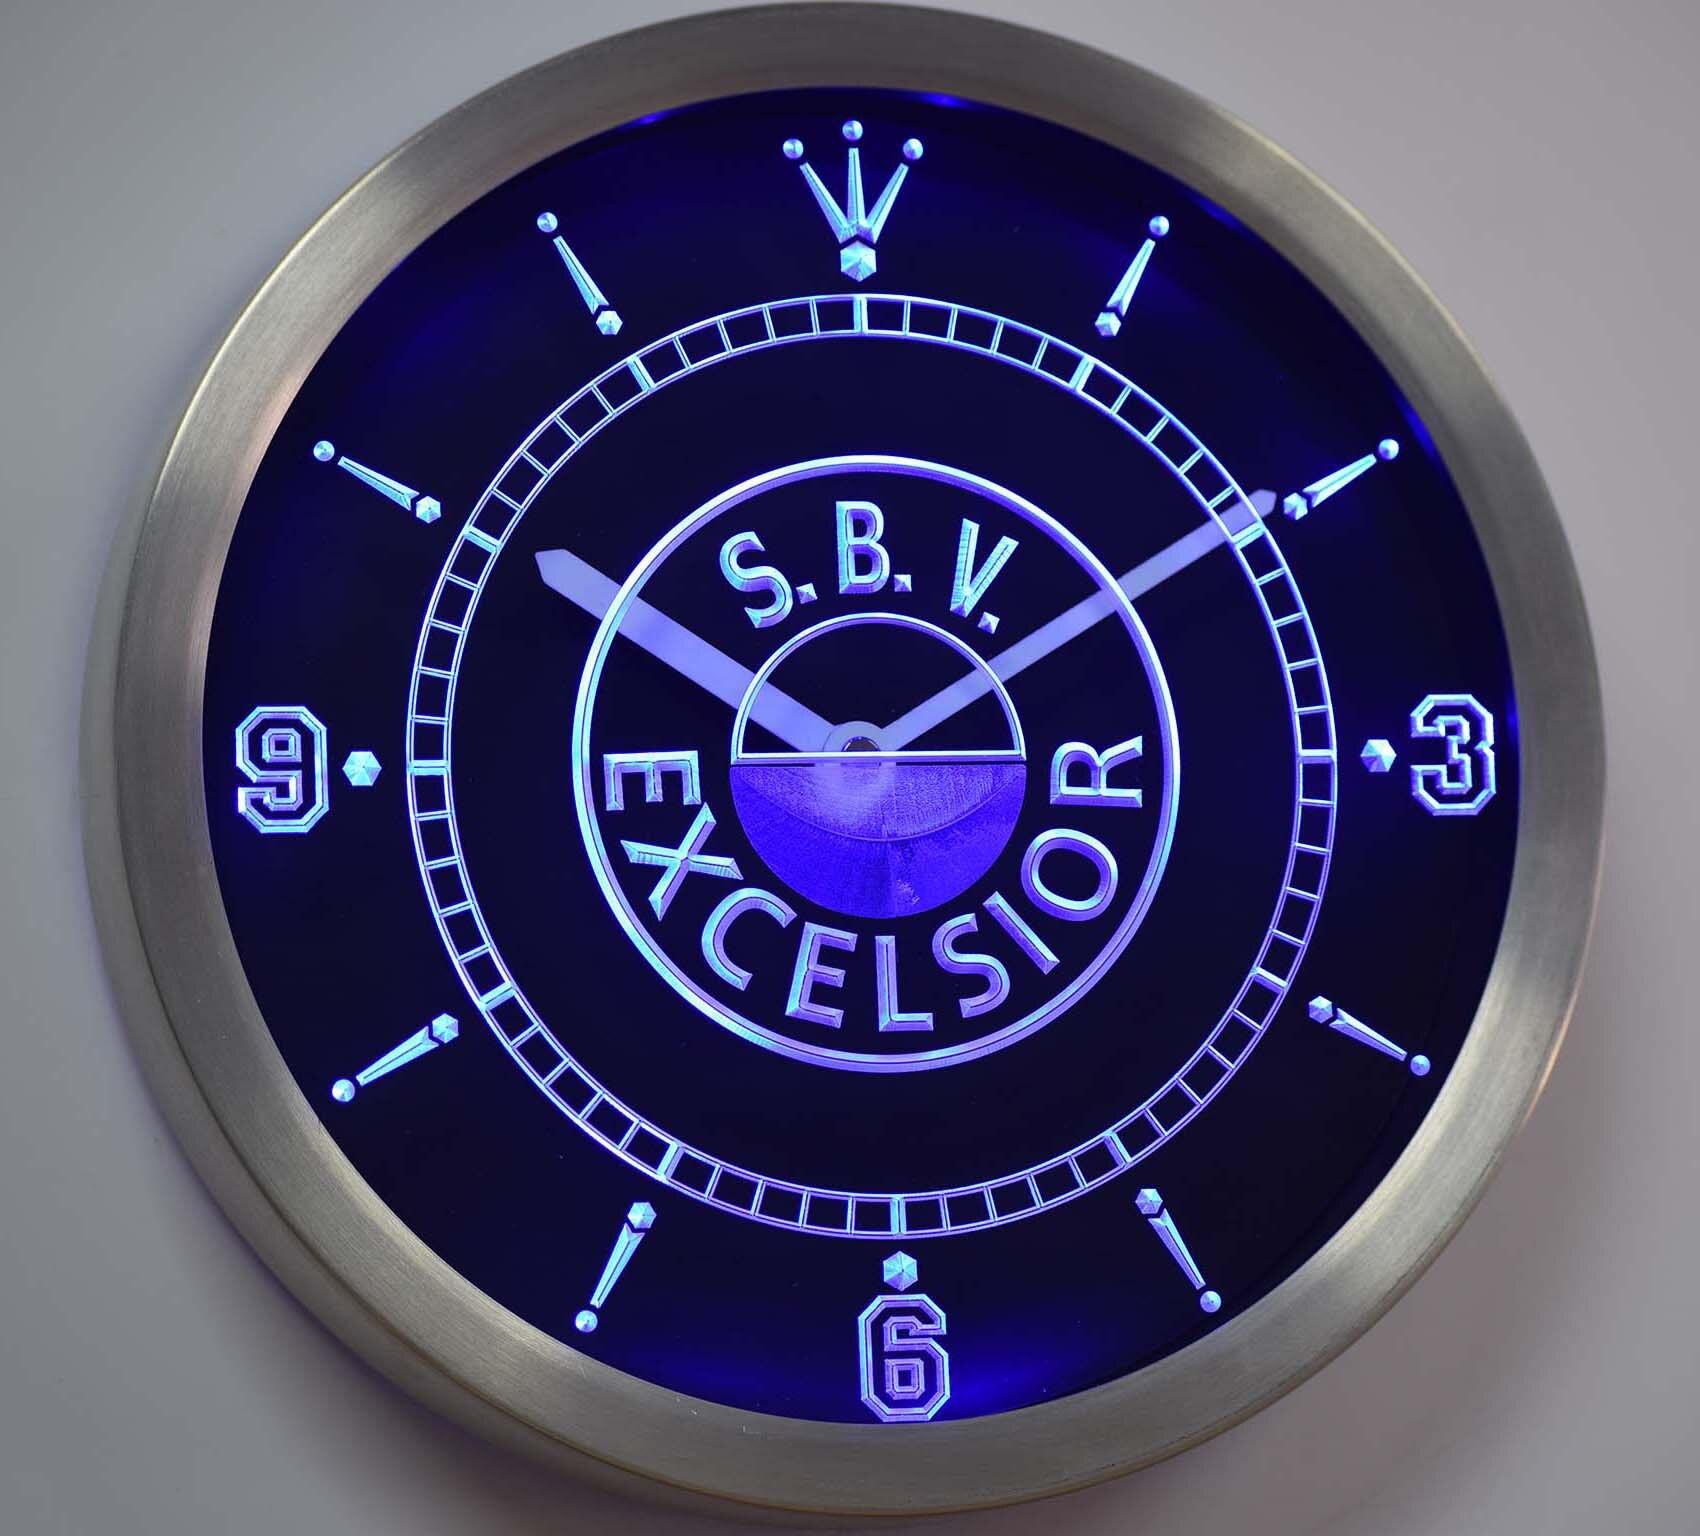 Nc1022 S.B.V. Horloge de mur LED au néon de Football